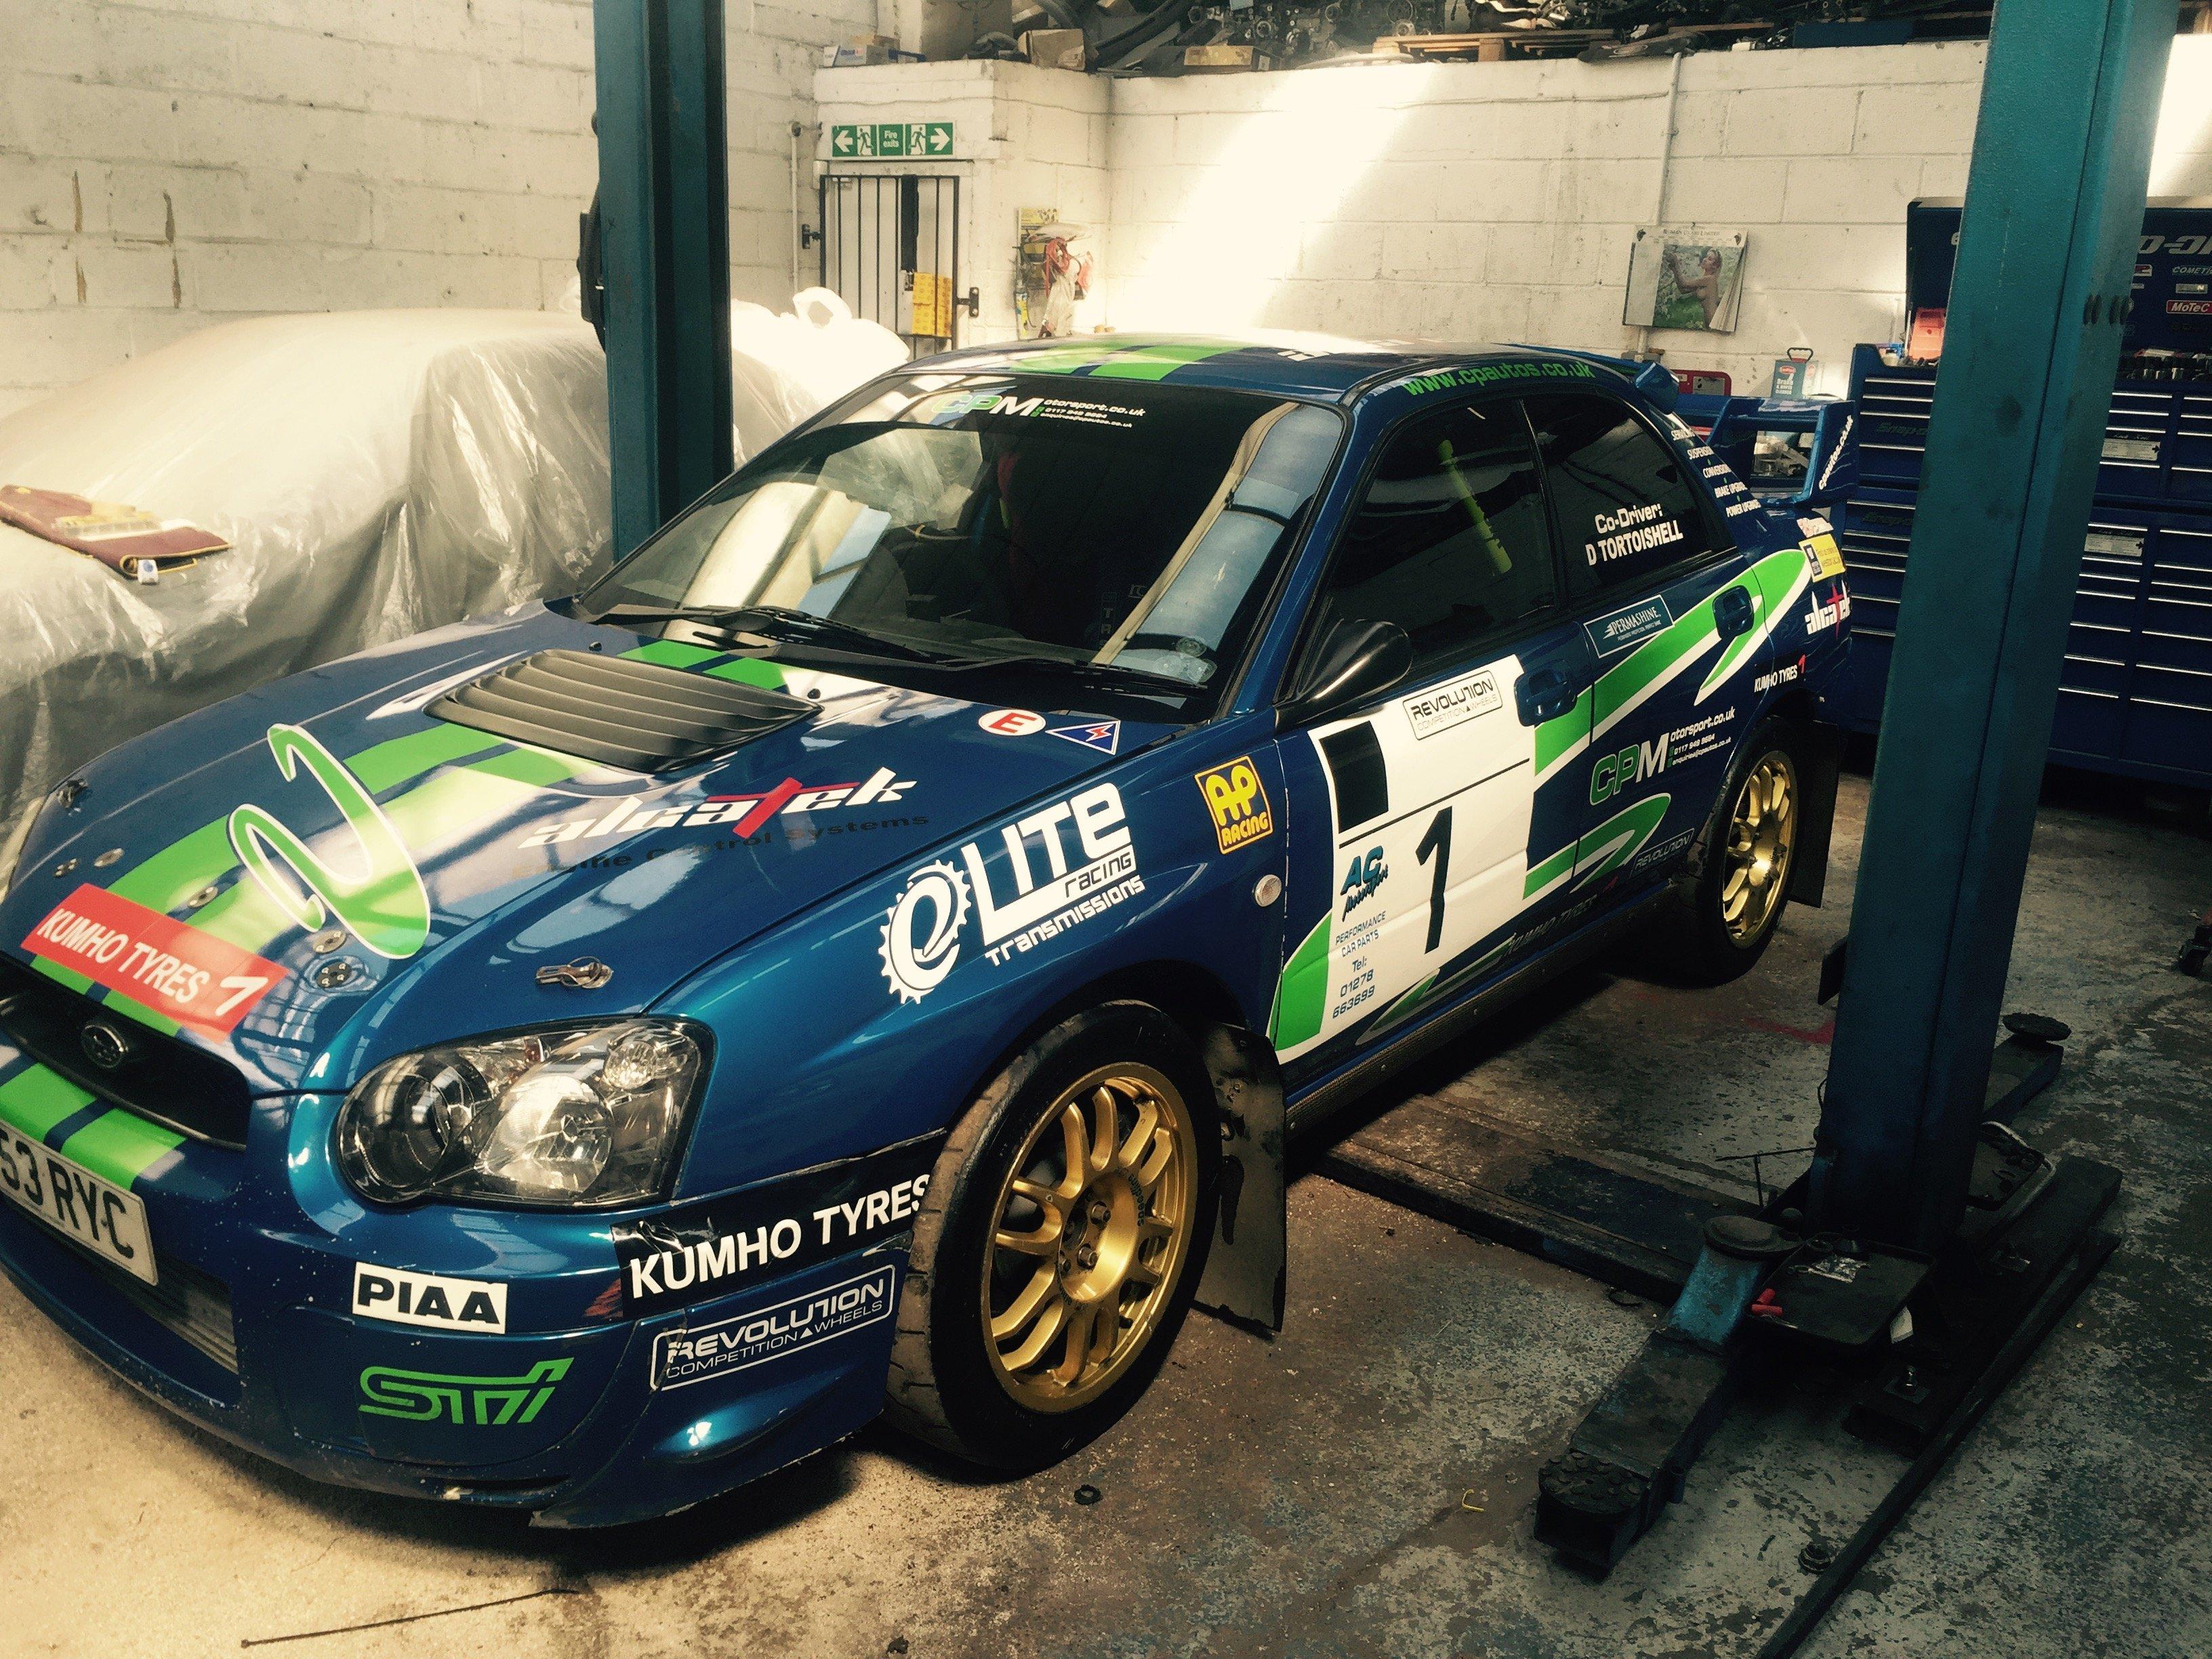 rally car engine checks